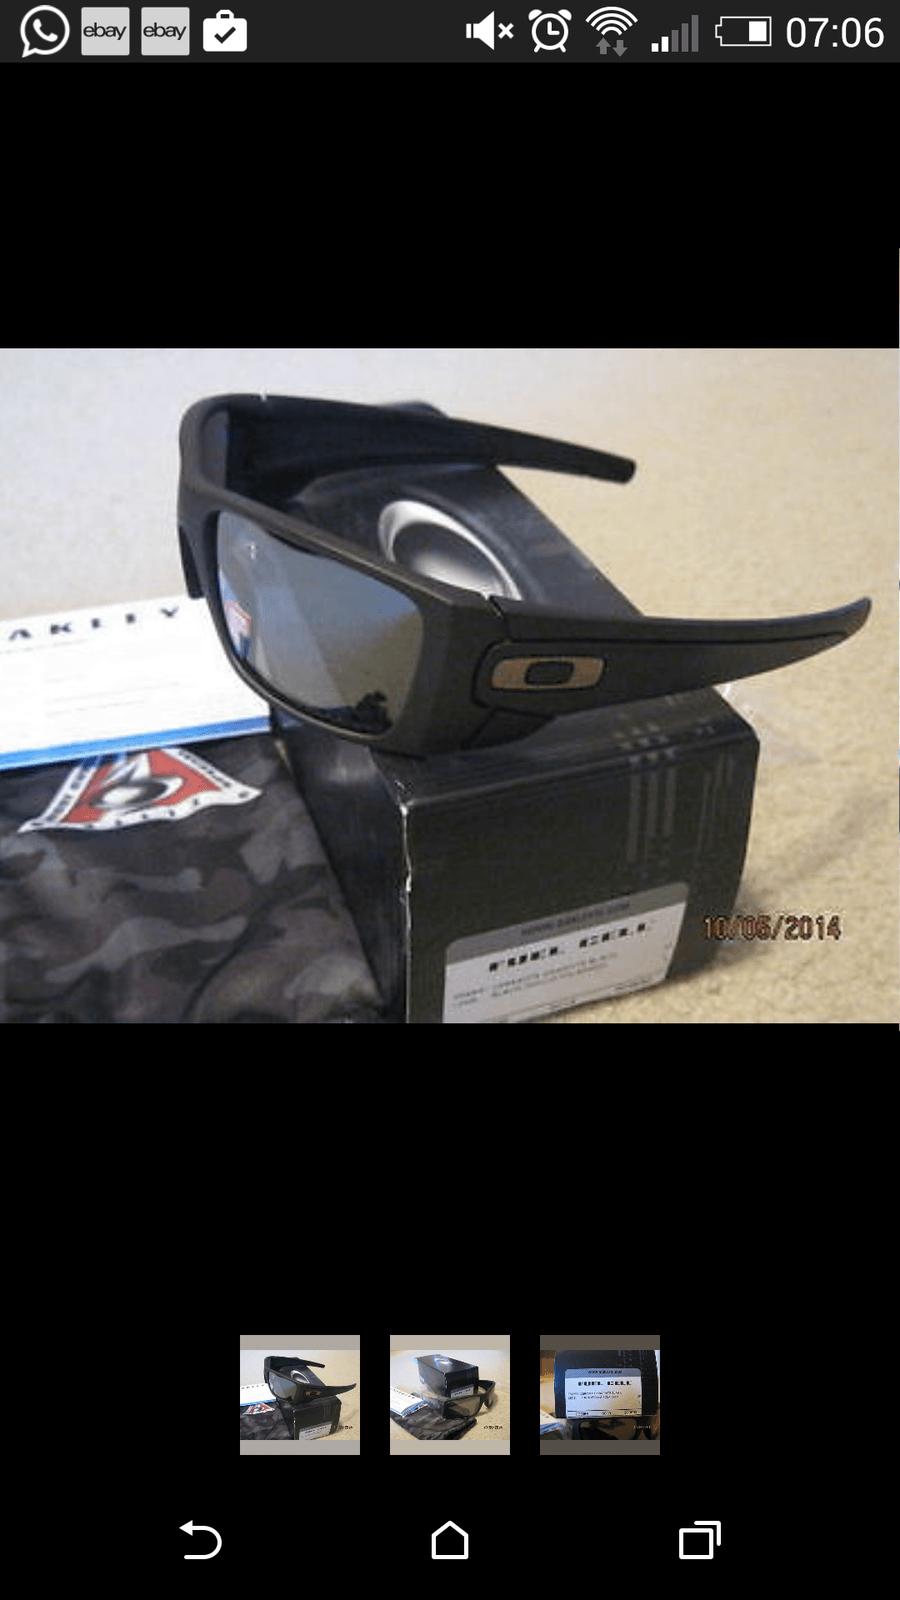 Cerakote Graphite Fuel Cell Black Iridium Polarized - screenshot_2014-11-20-07-06-59-png.115502.png